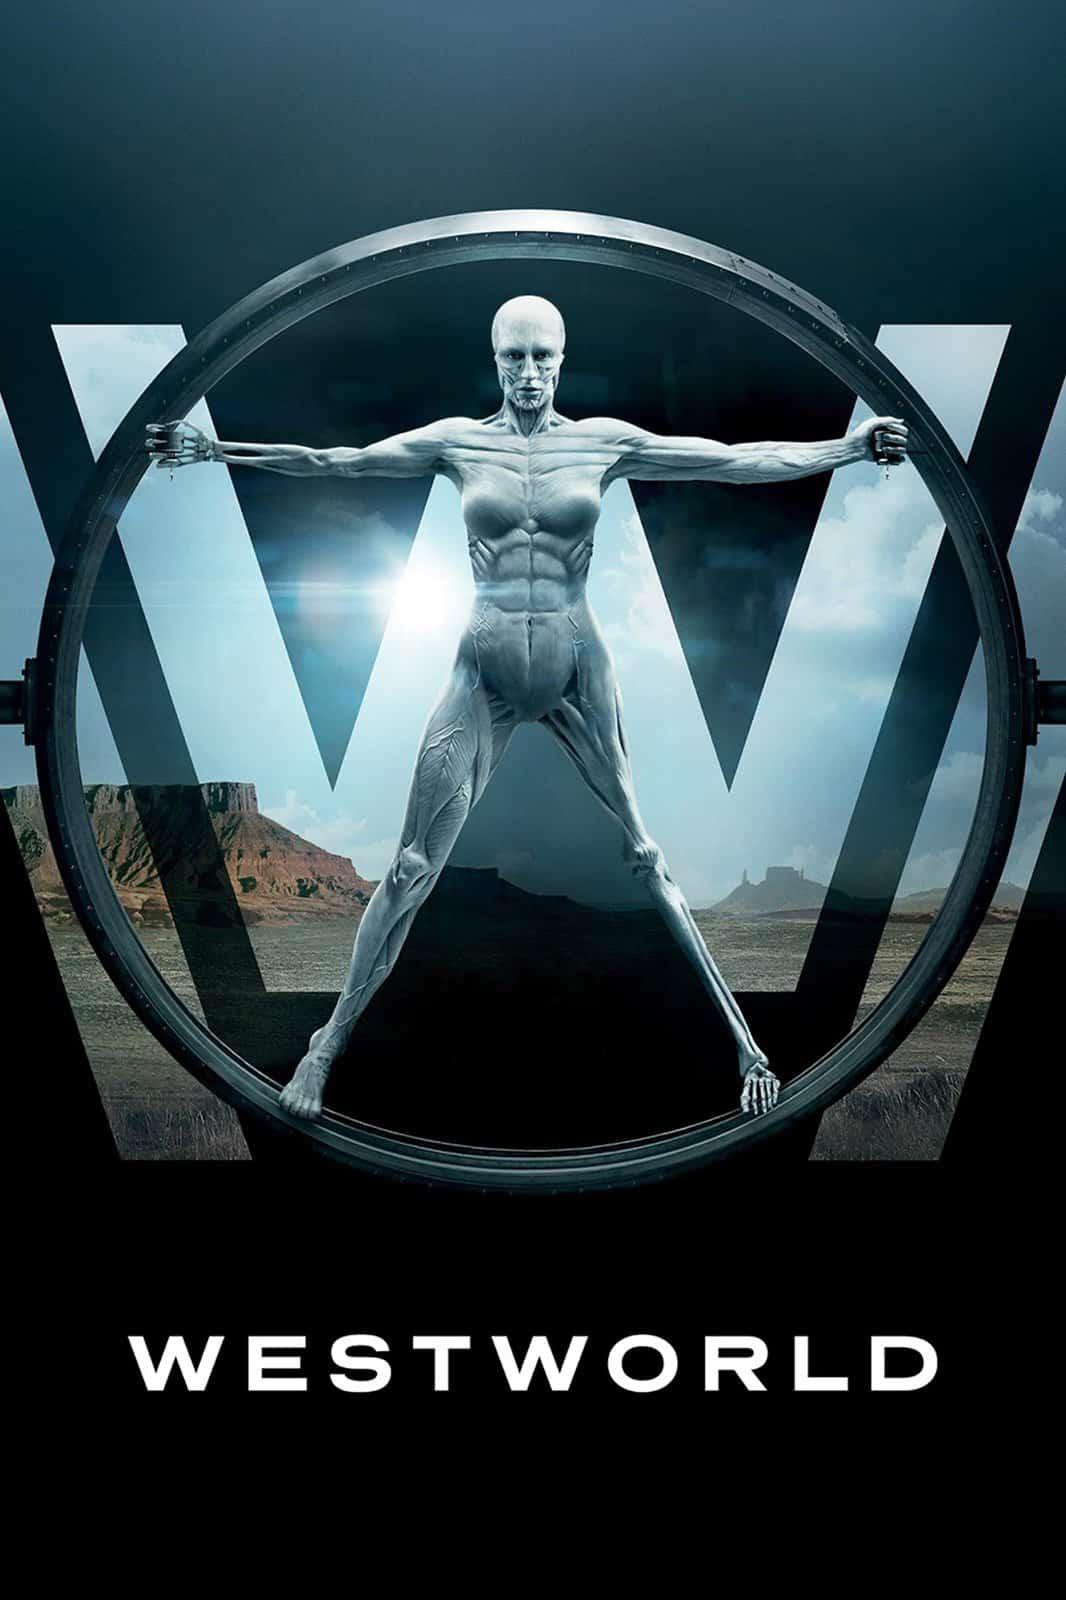 Westworld, 2016